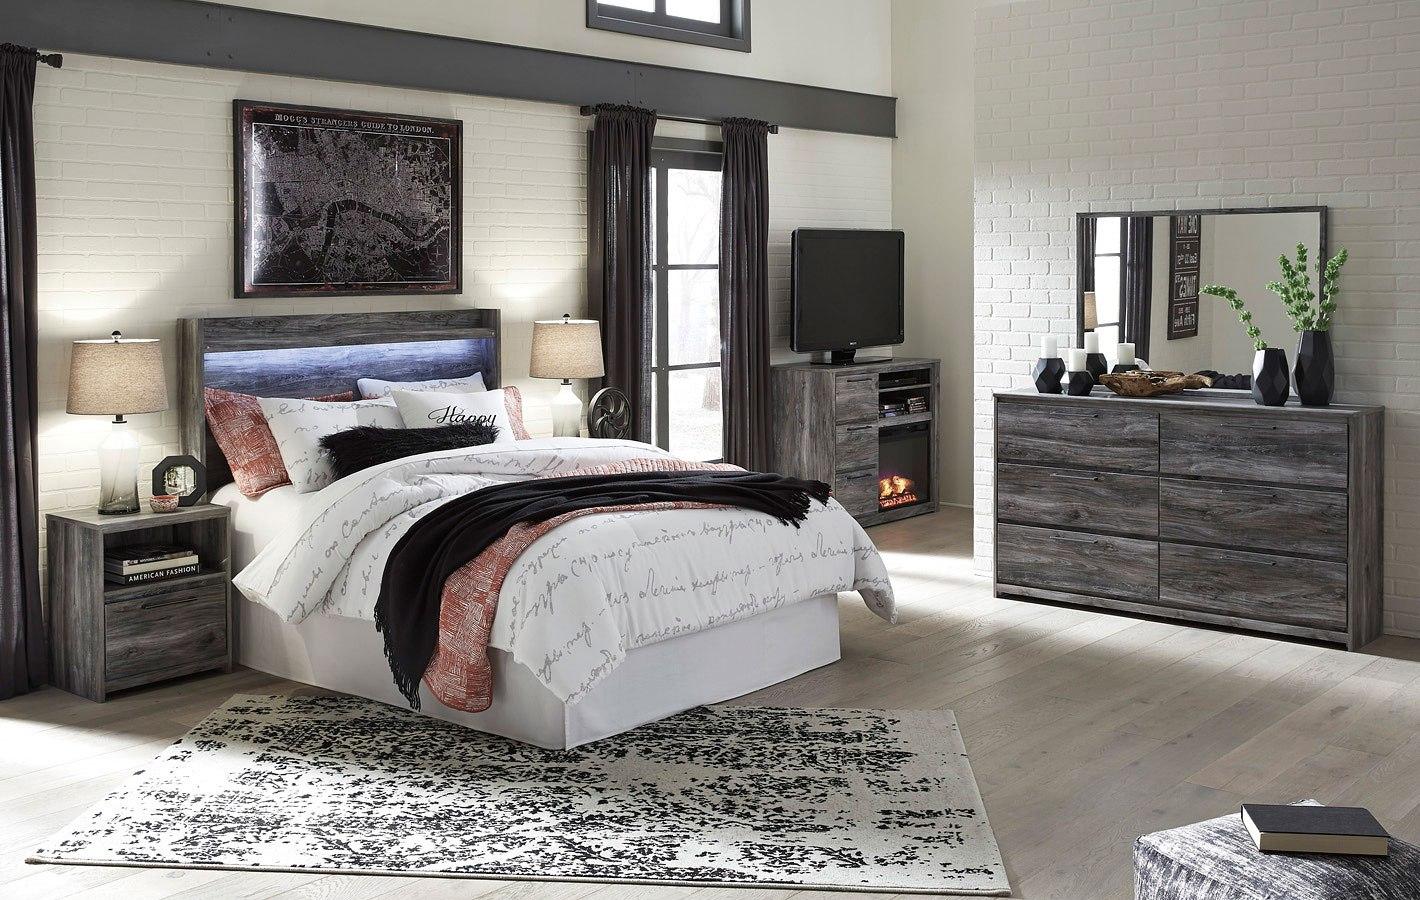 Baystorm Headboard Bedroom Set